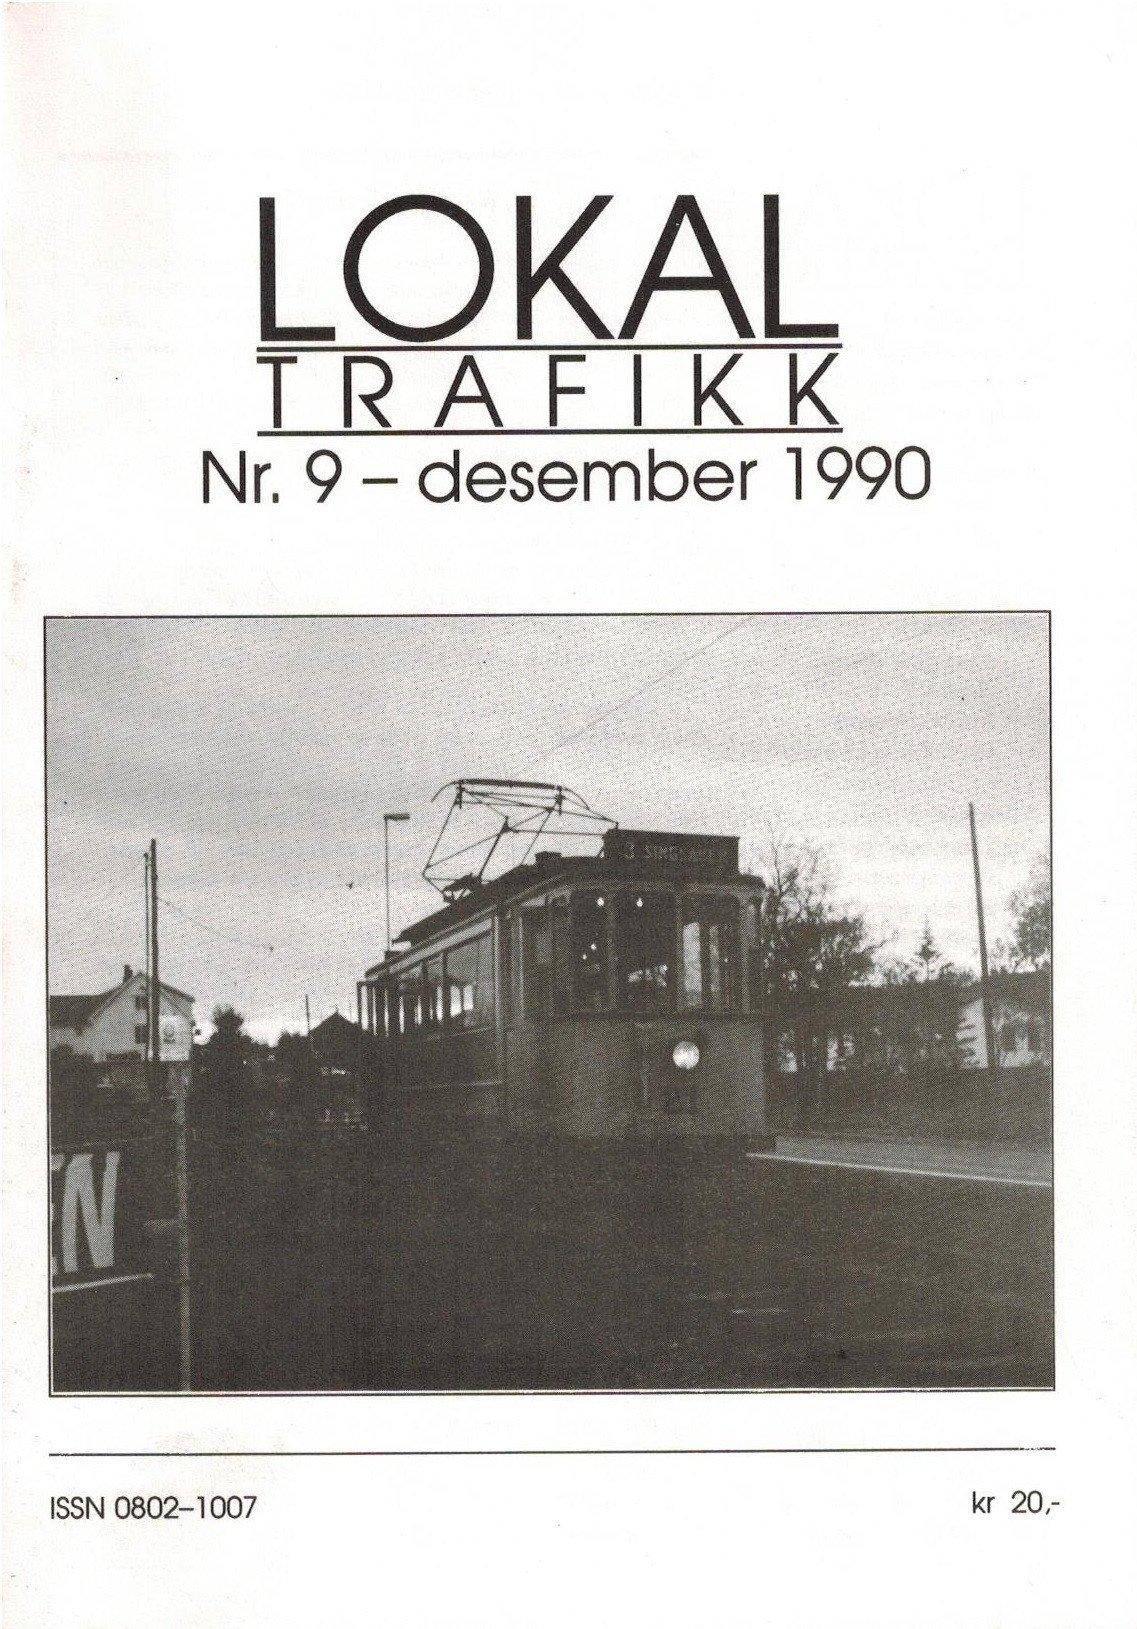 Lokaltrafikk #009